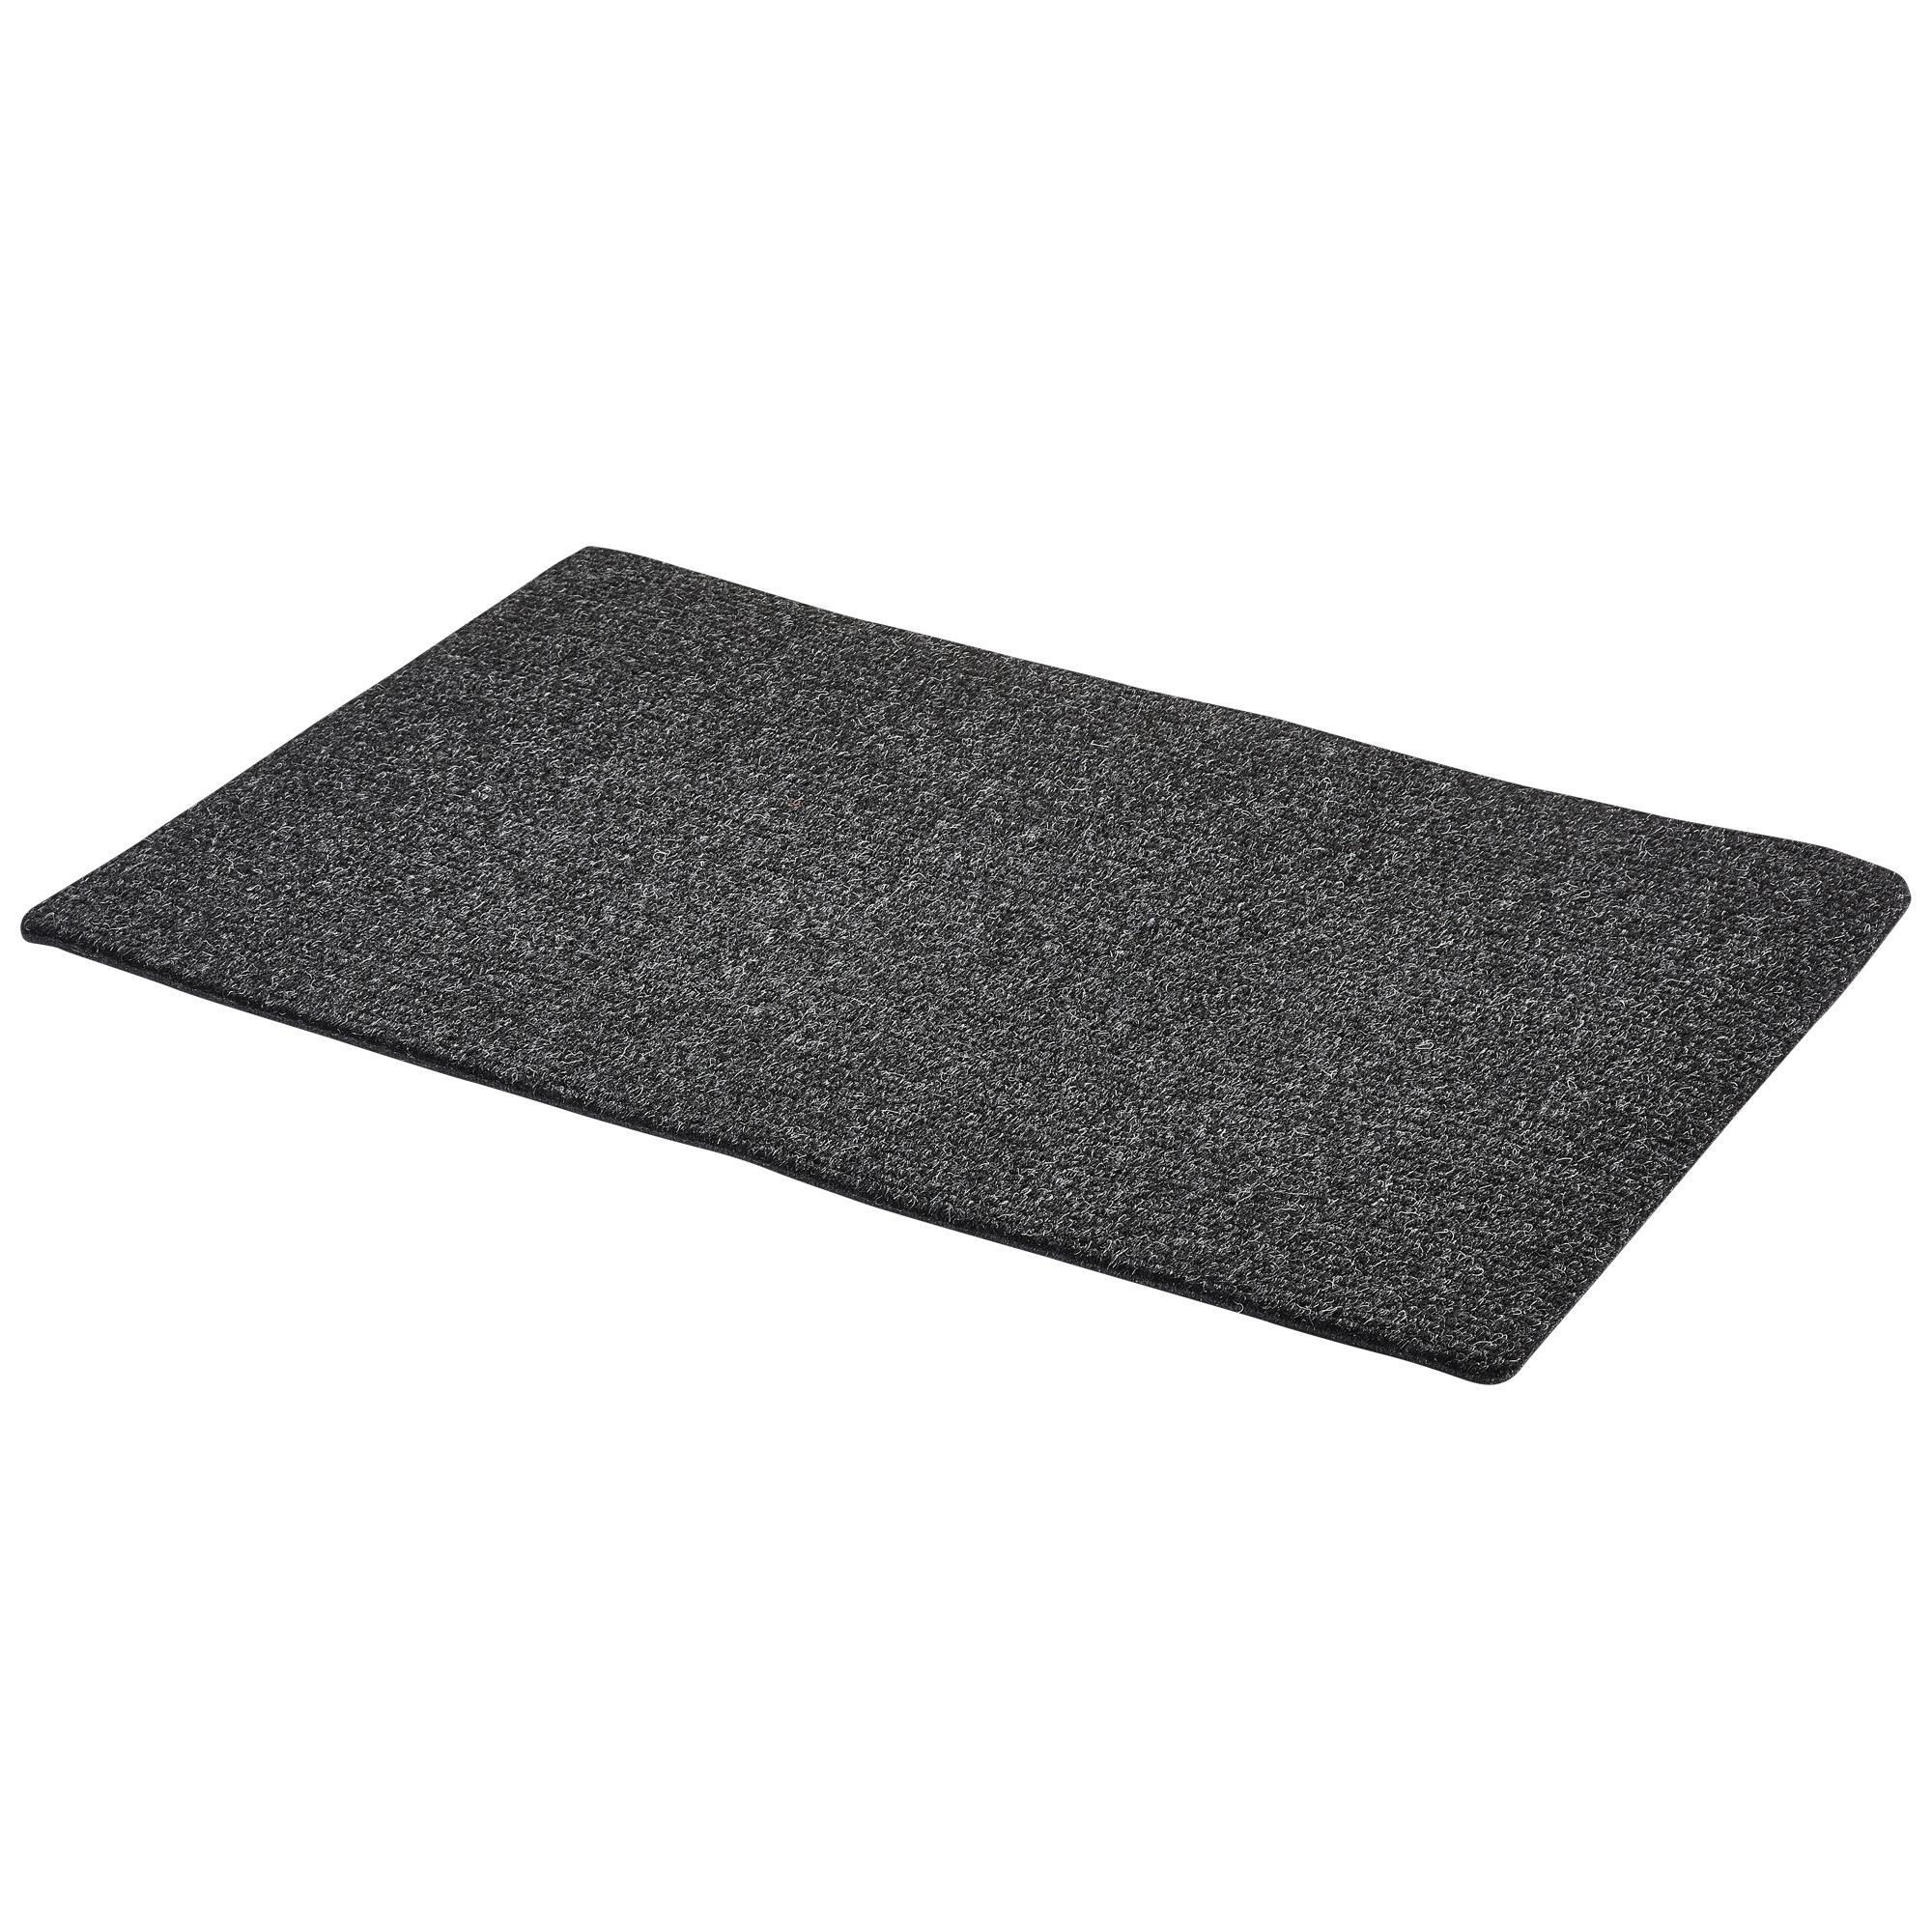 Schraapmat 50x80 cm zwart